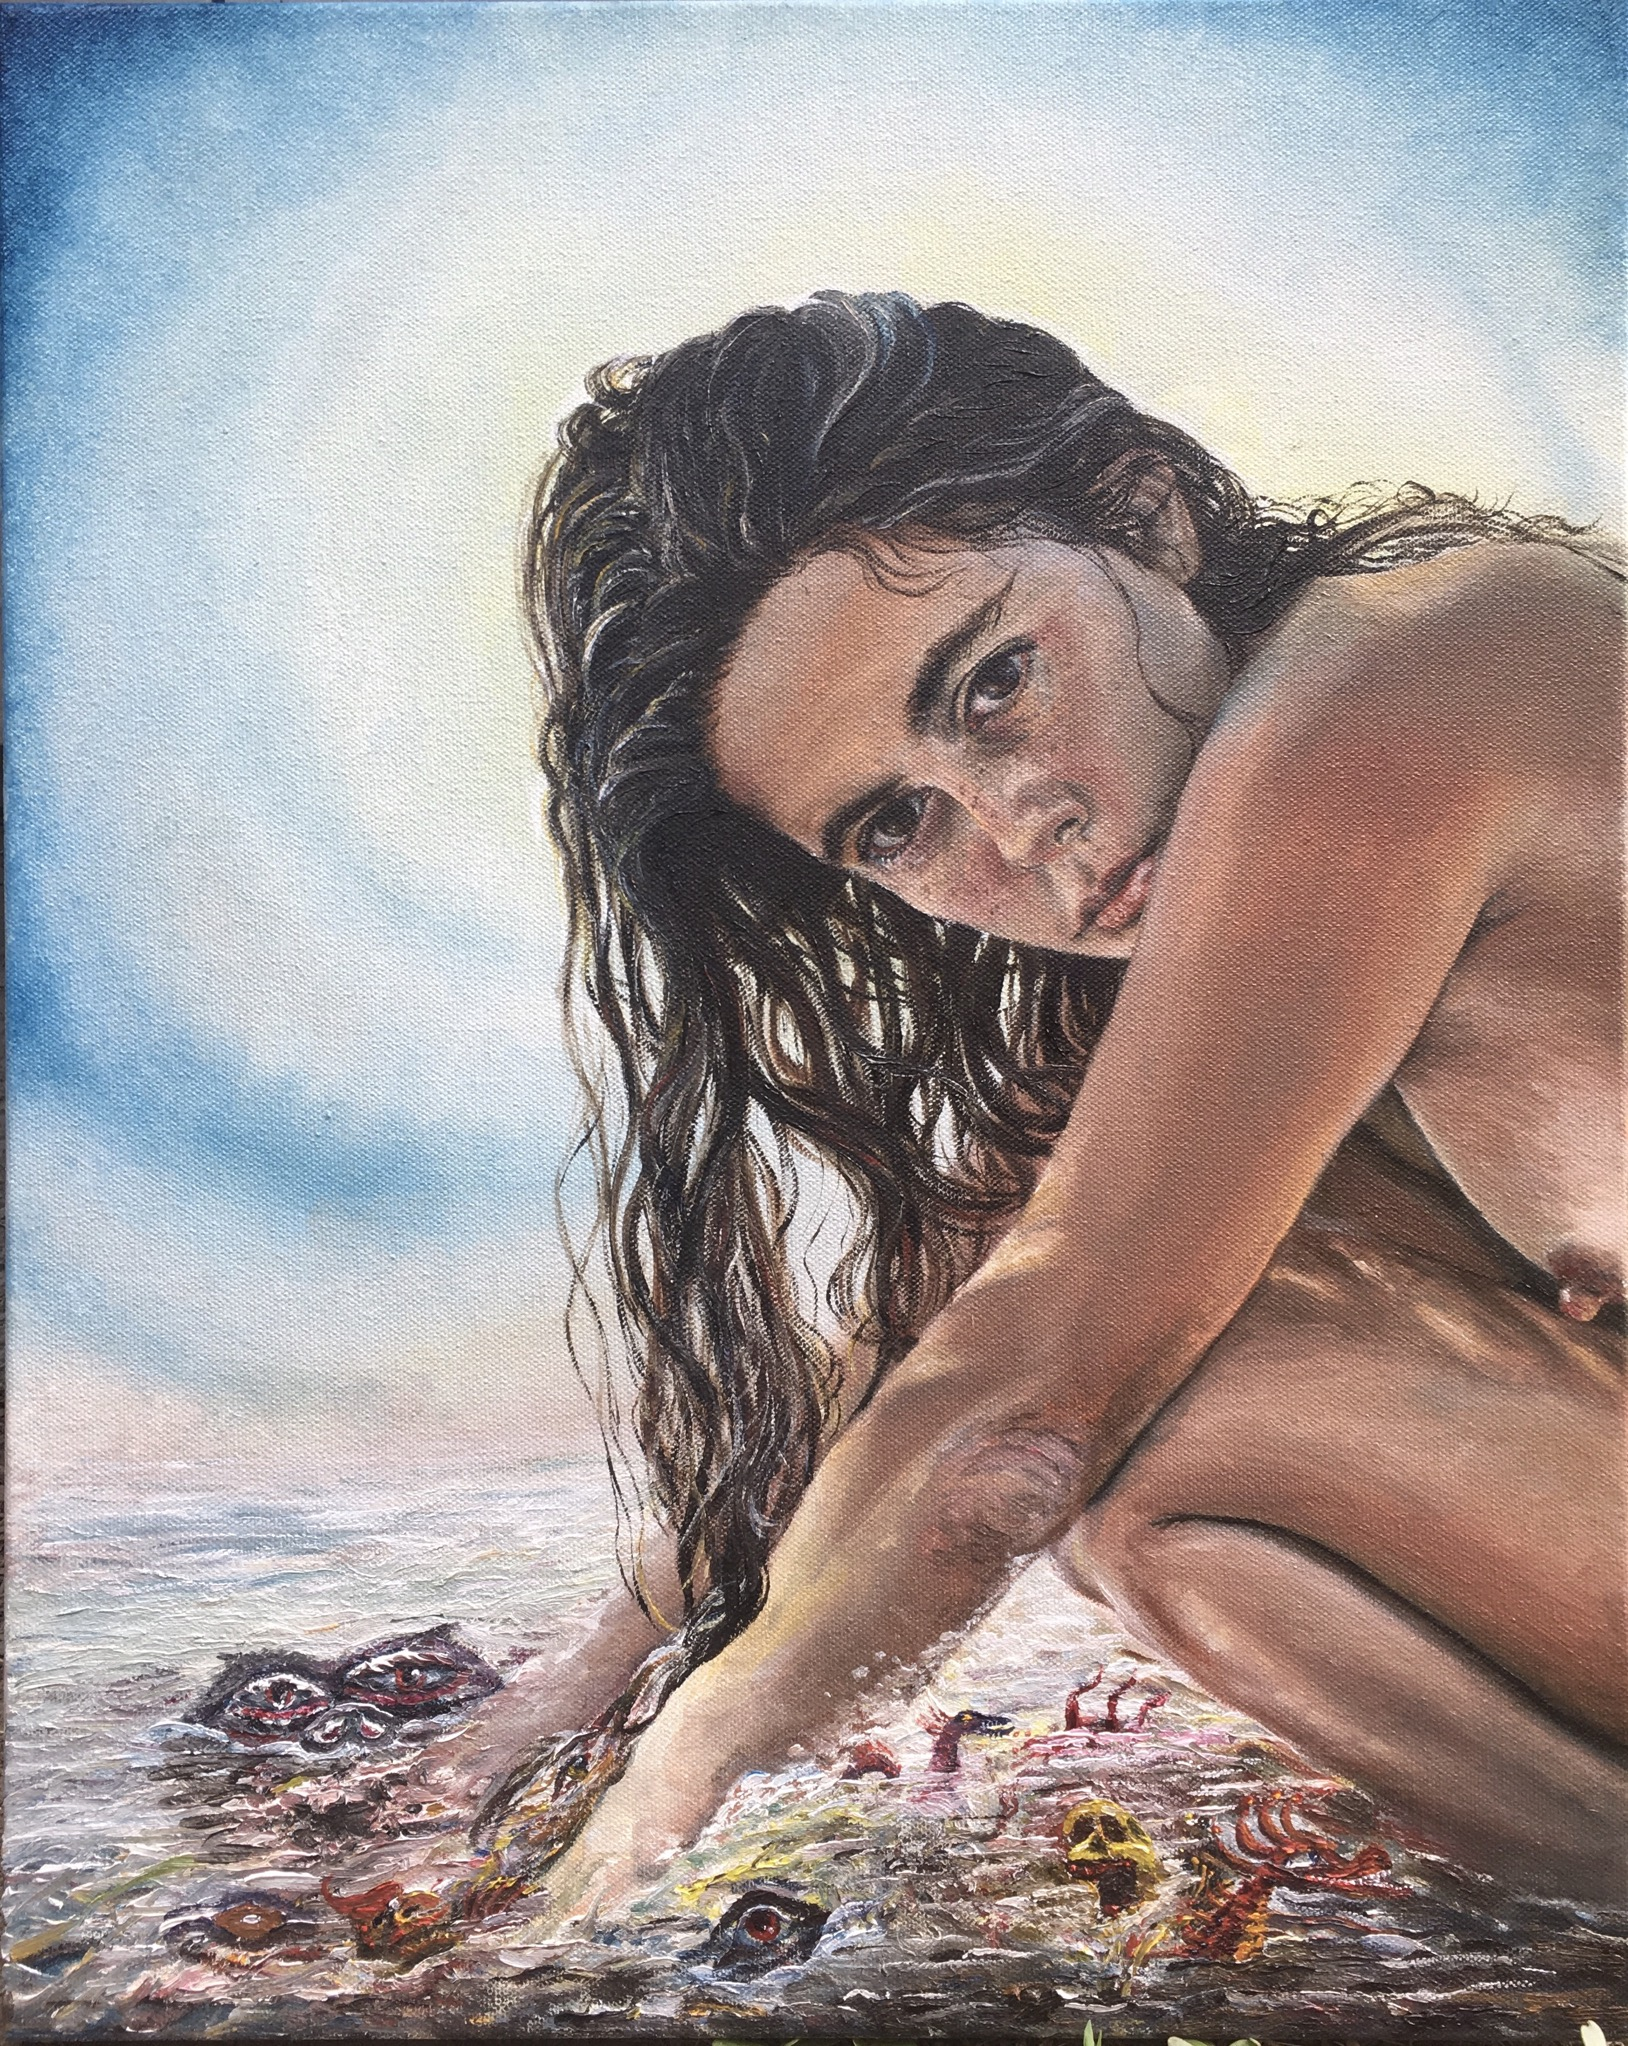 Divine goddess self portrait